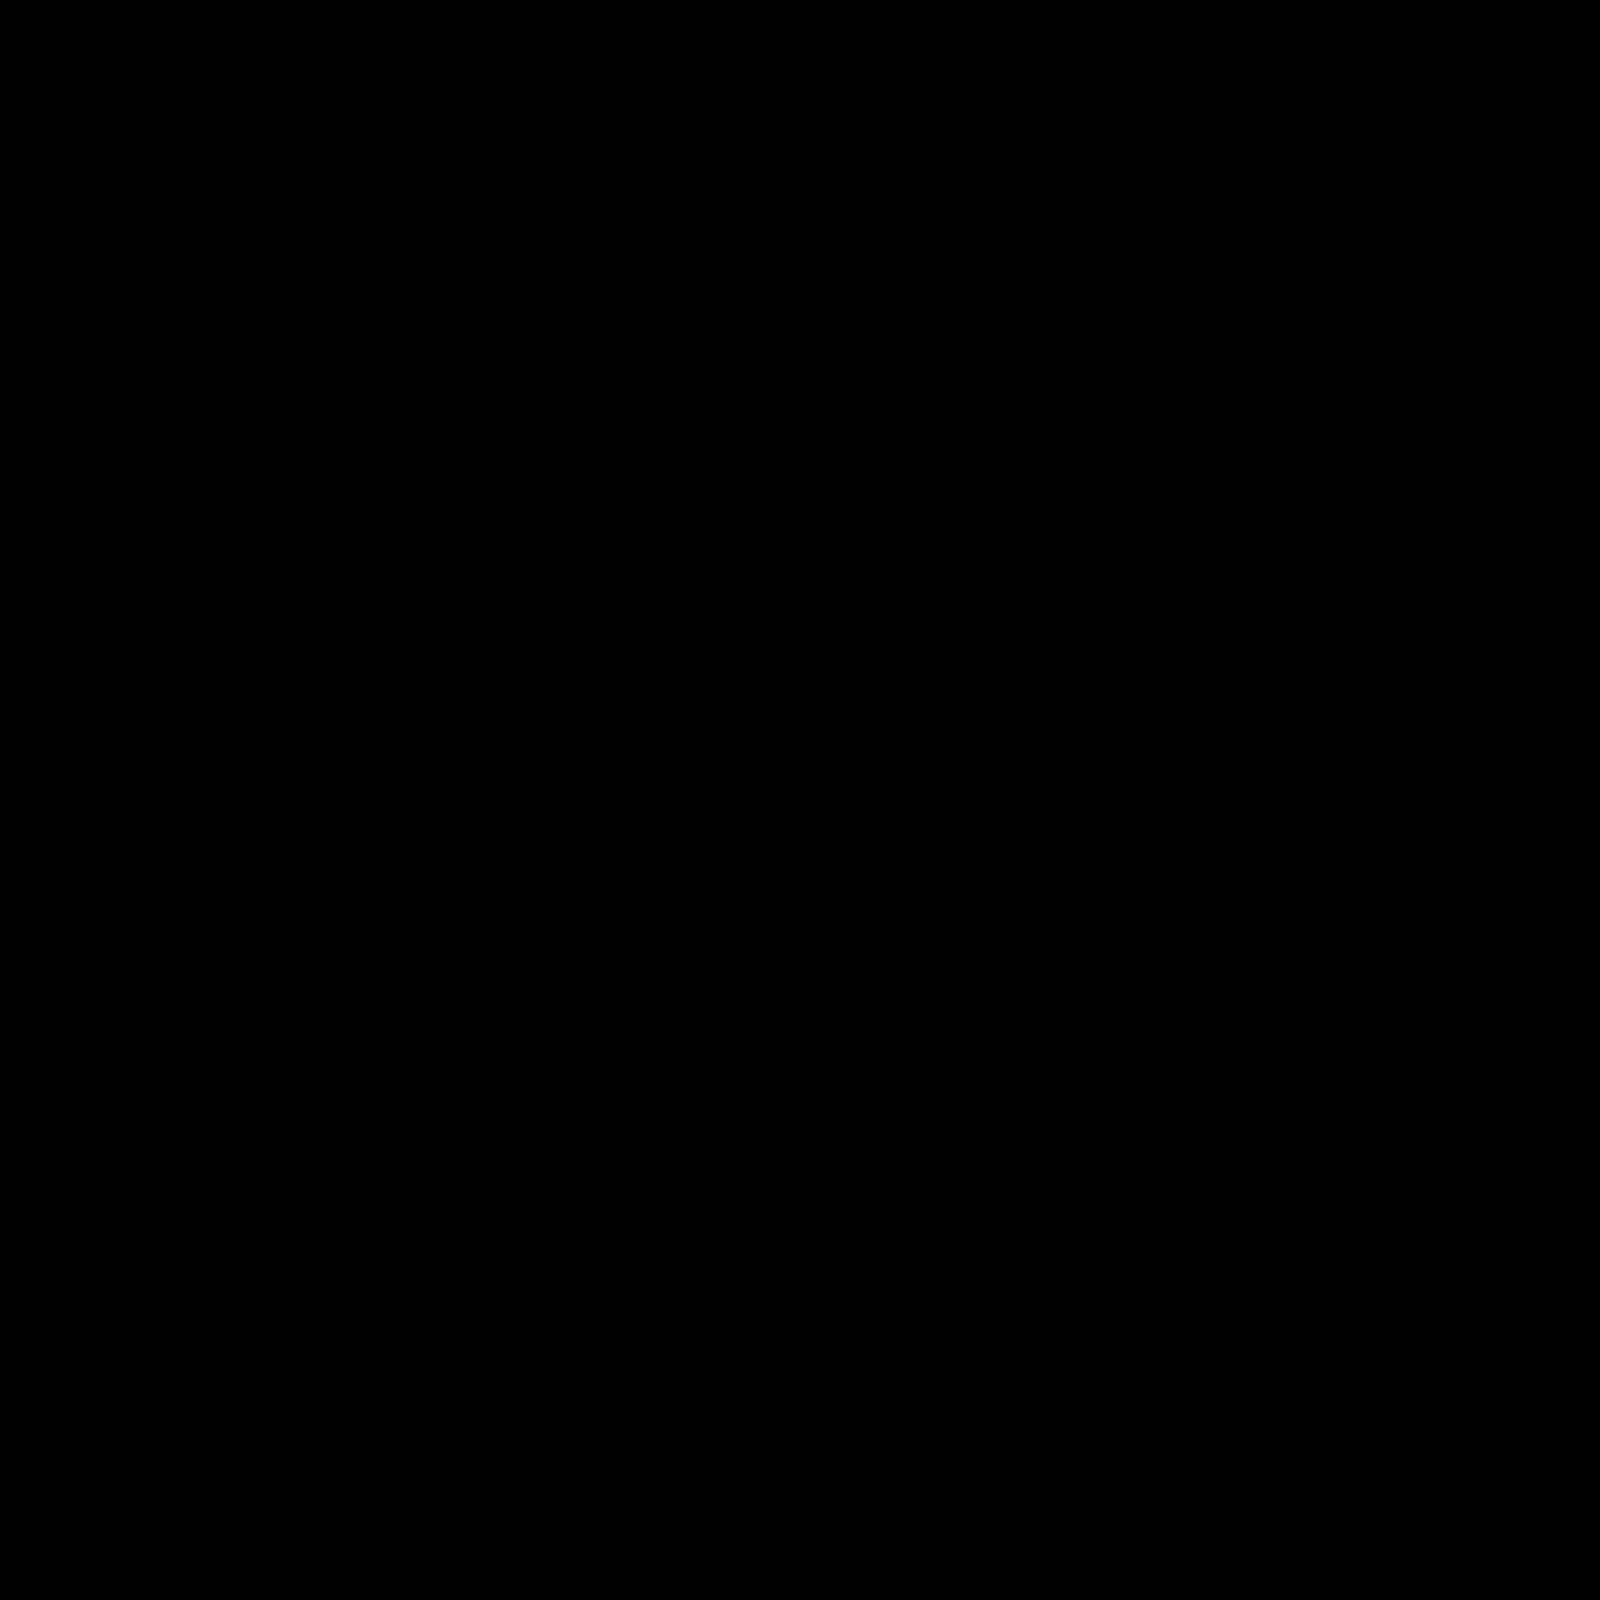 Clipart house thin windows clipart black and white Иконка Rent - скачать бесплатно в PNG и векторе clipart black and white